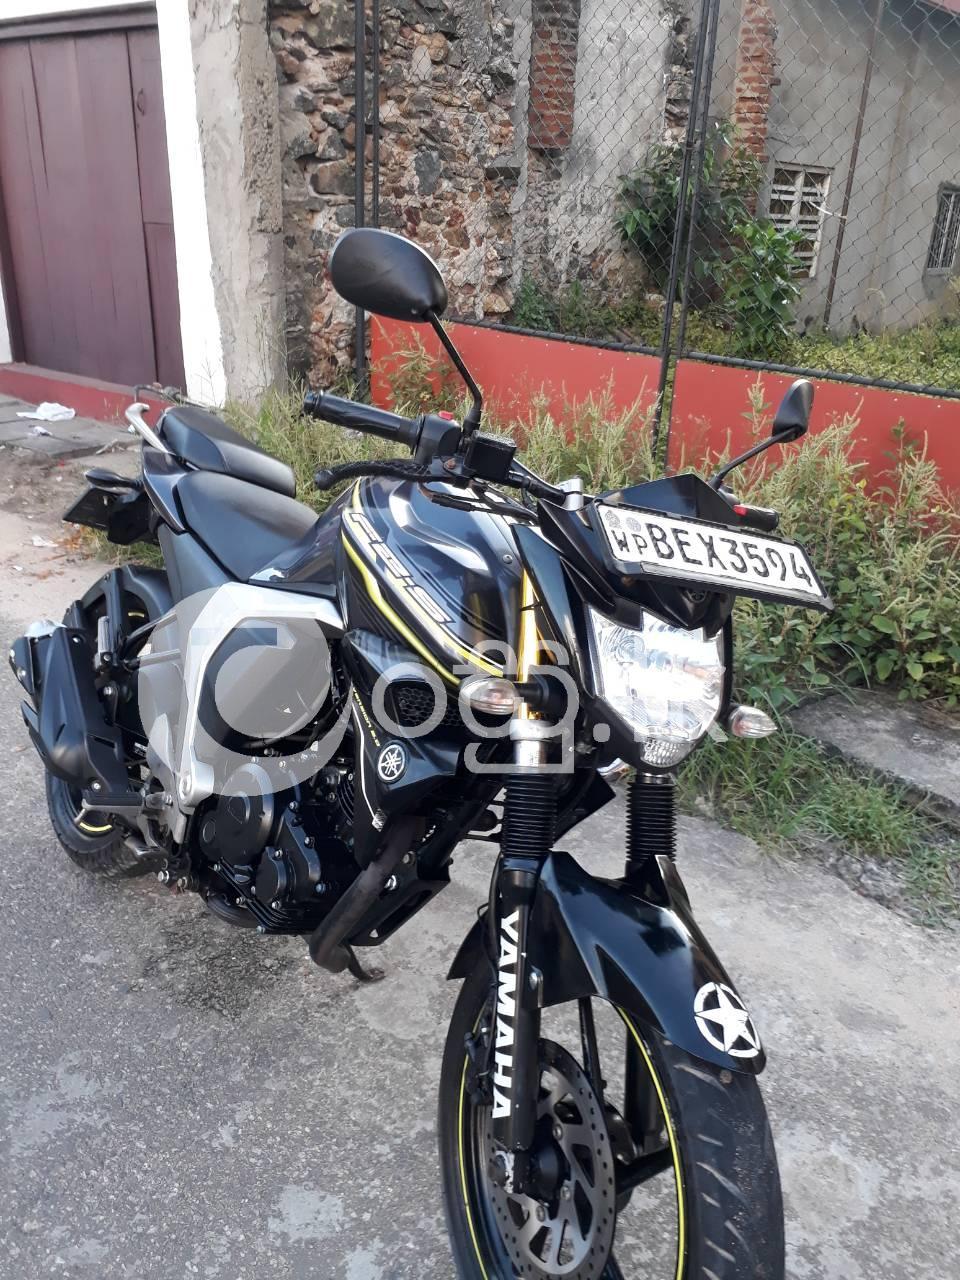 Bike for Sale in Balapitiya Motorbikes & Scooters in Balapitiya